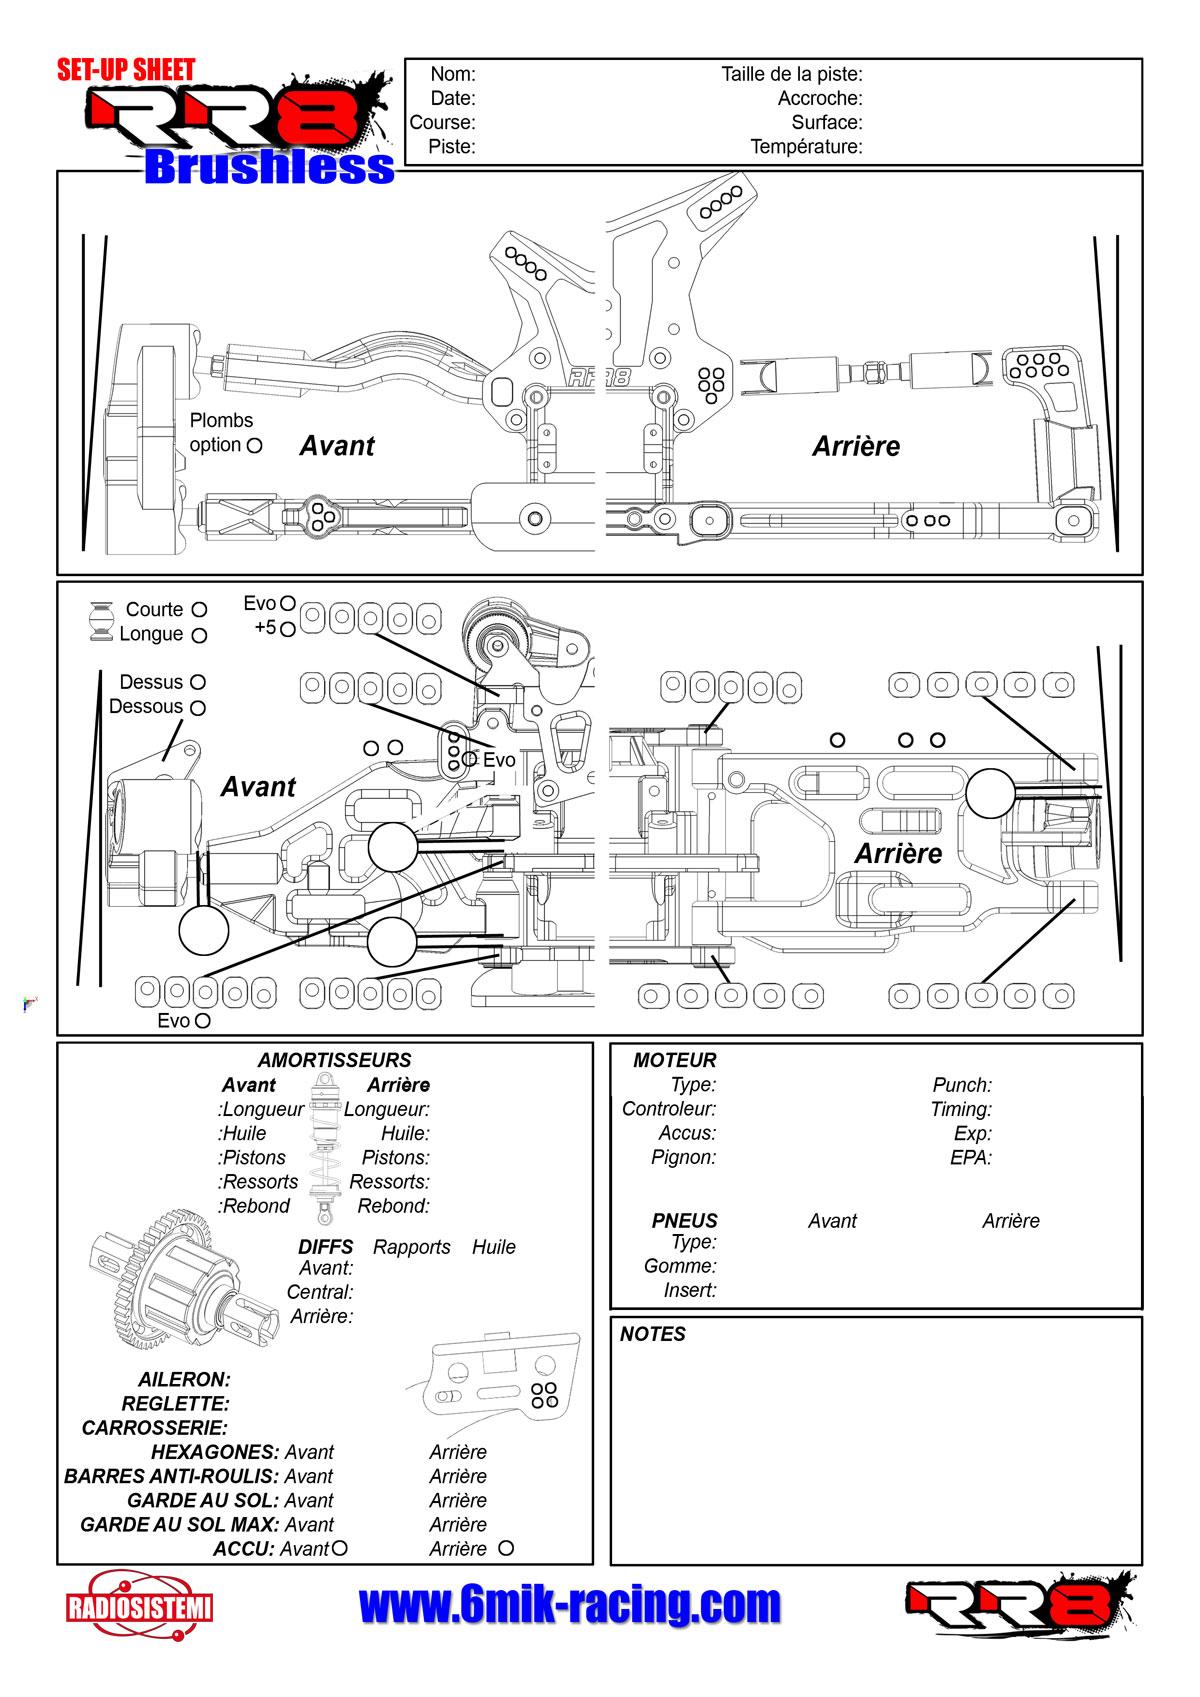 RR8E-set-up-vierge